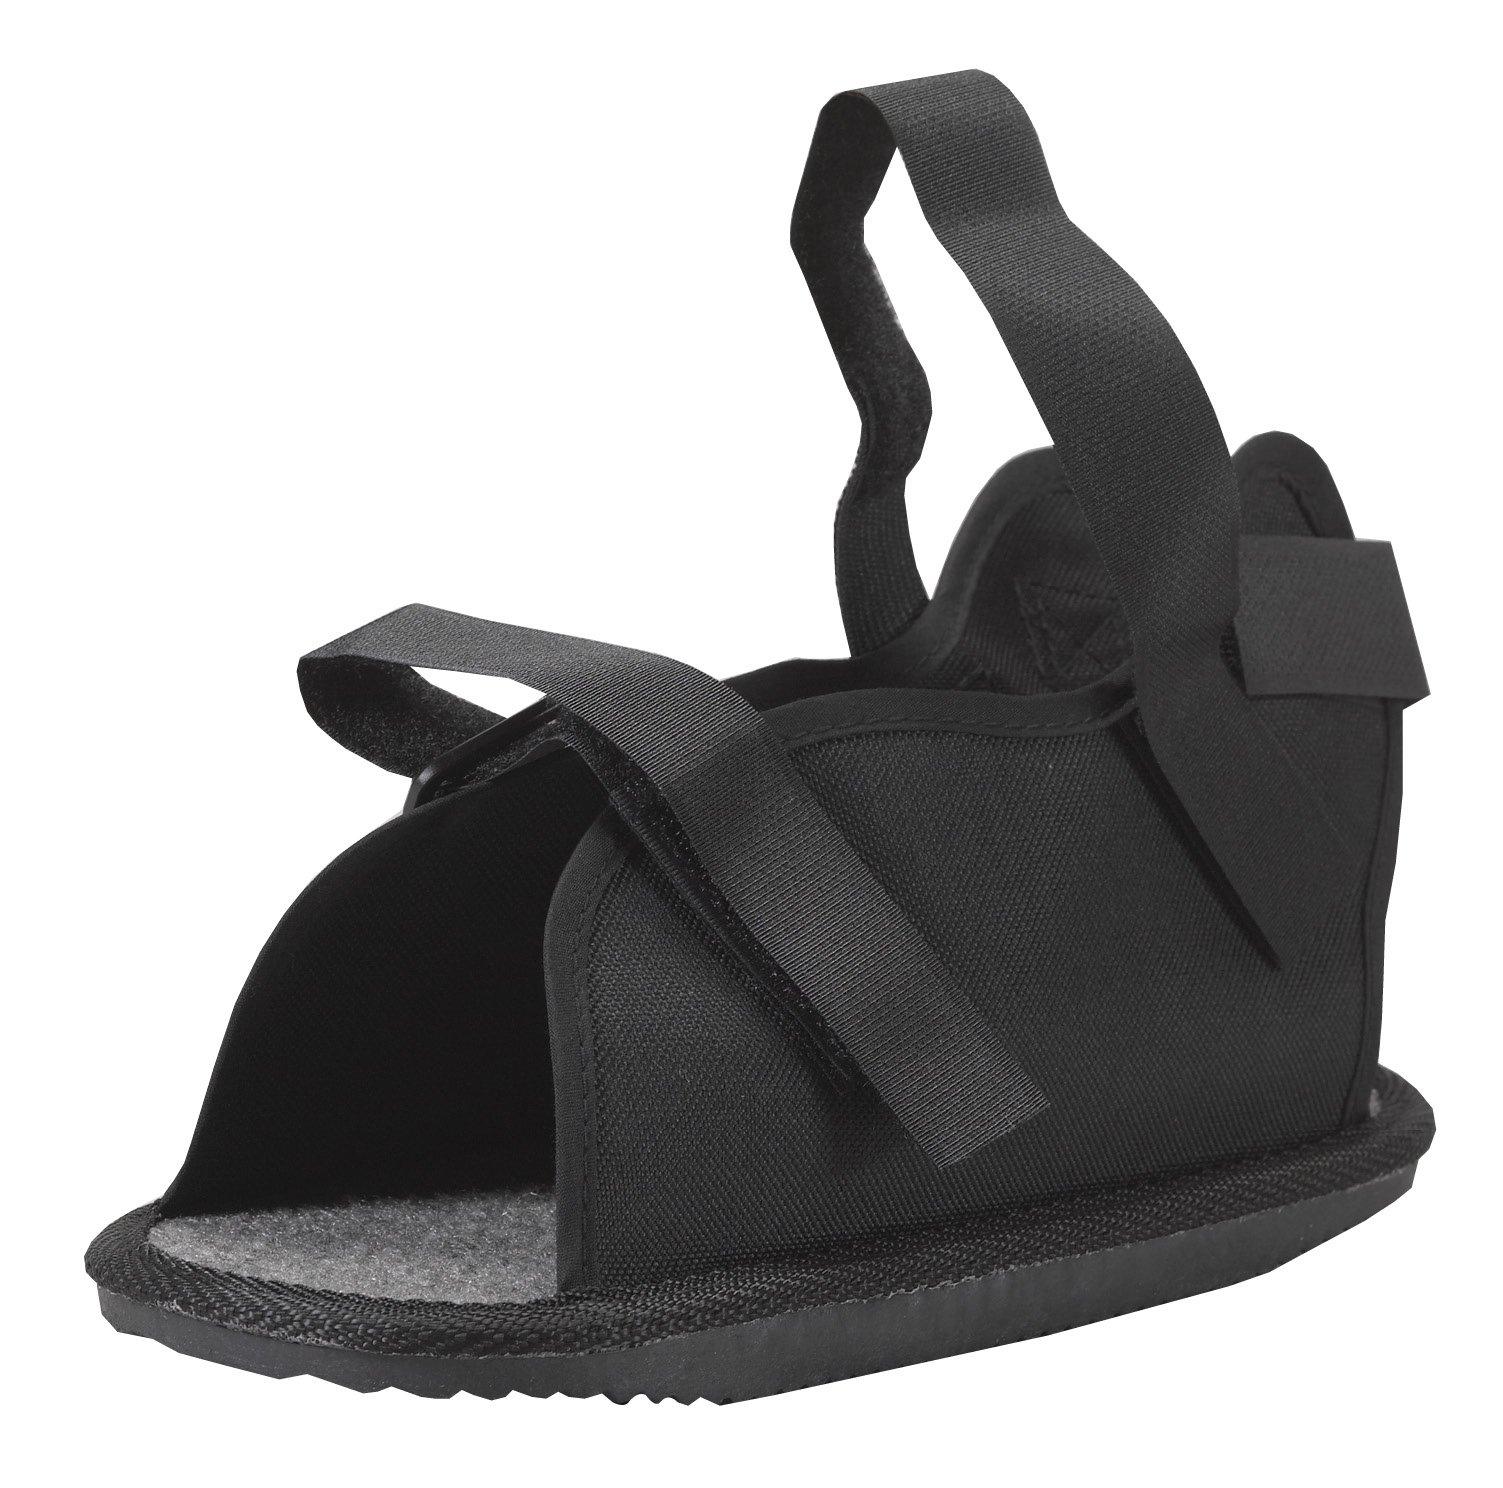 Bilt-Rite Mastex Health Economy Open Toe Cast Boot, Black, Large